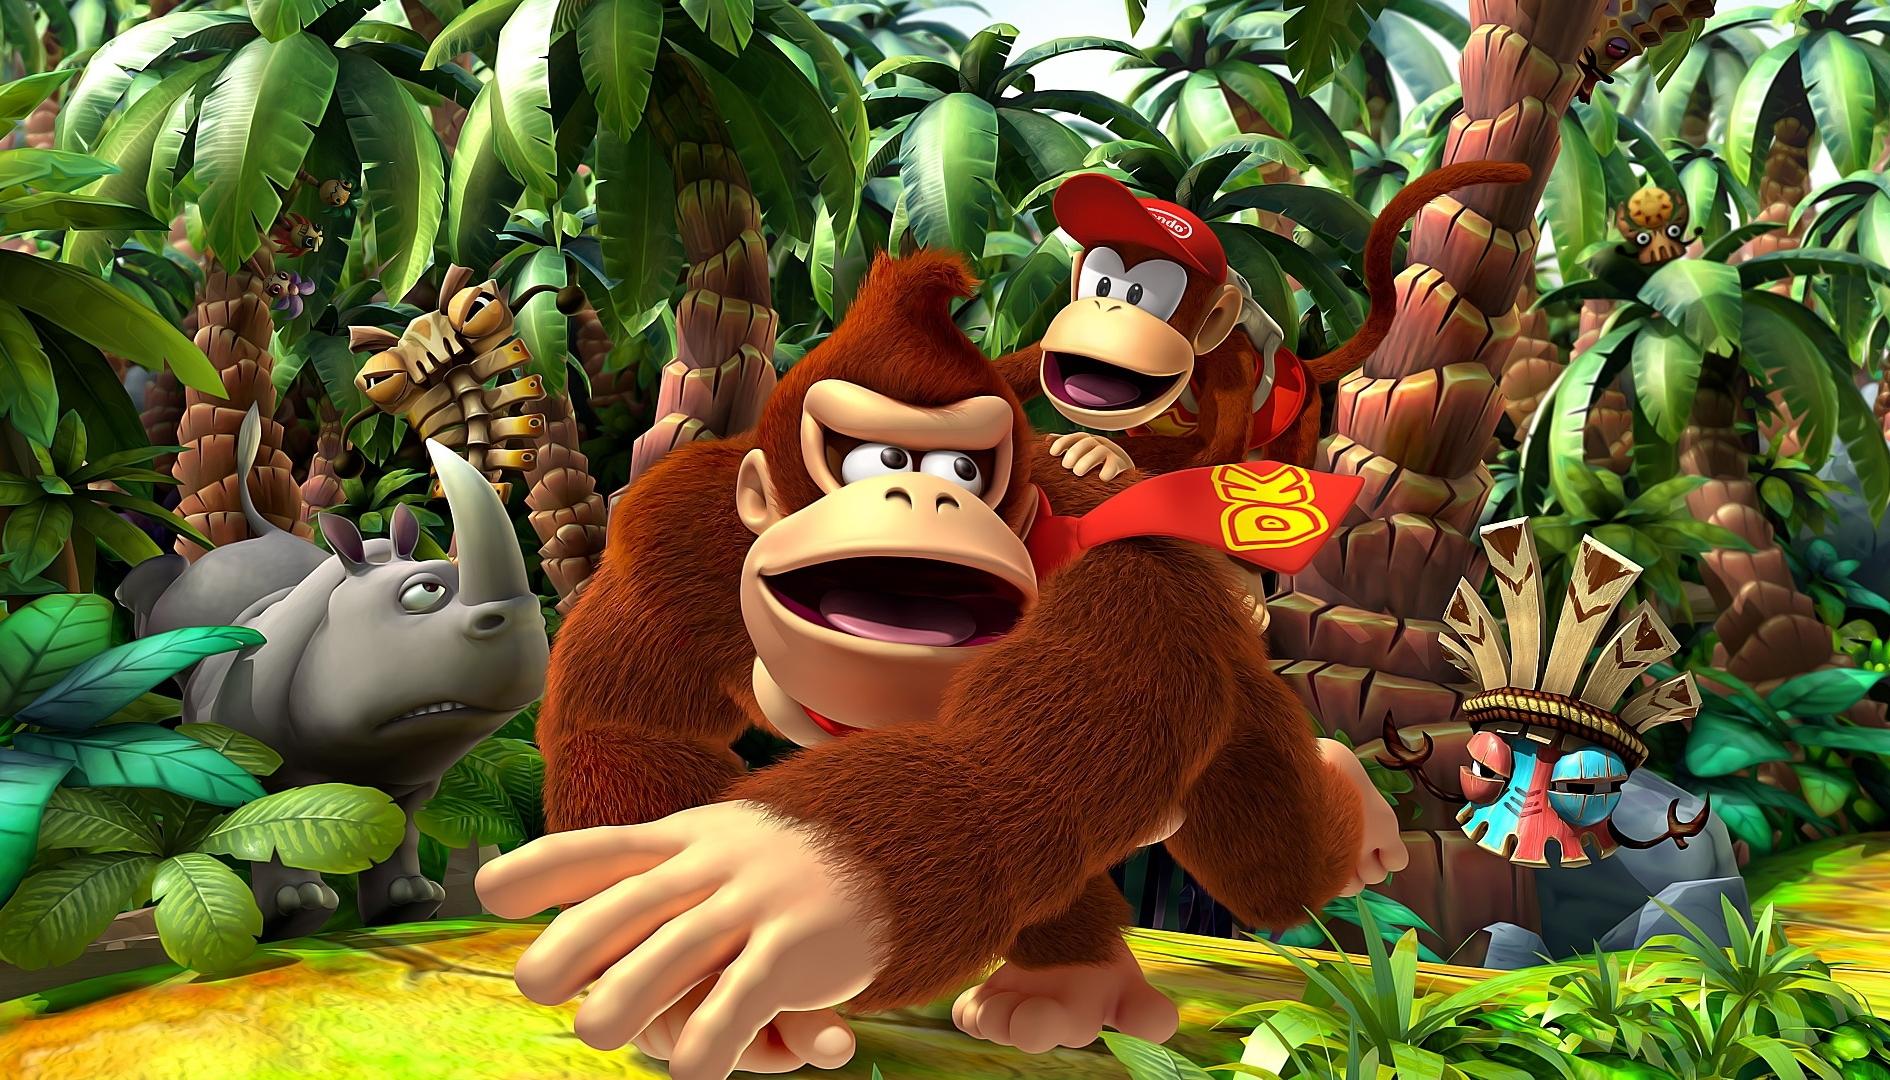 Donkey Kong, non solo videogiochi: i piani di Nintendo